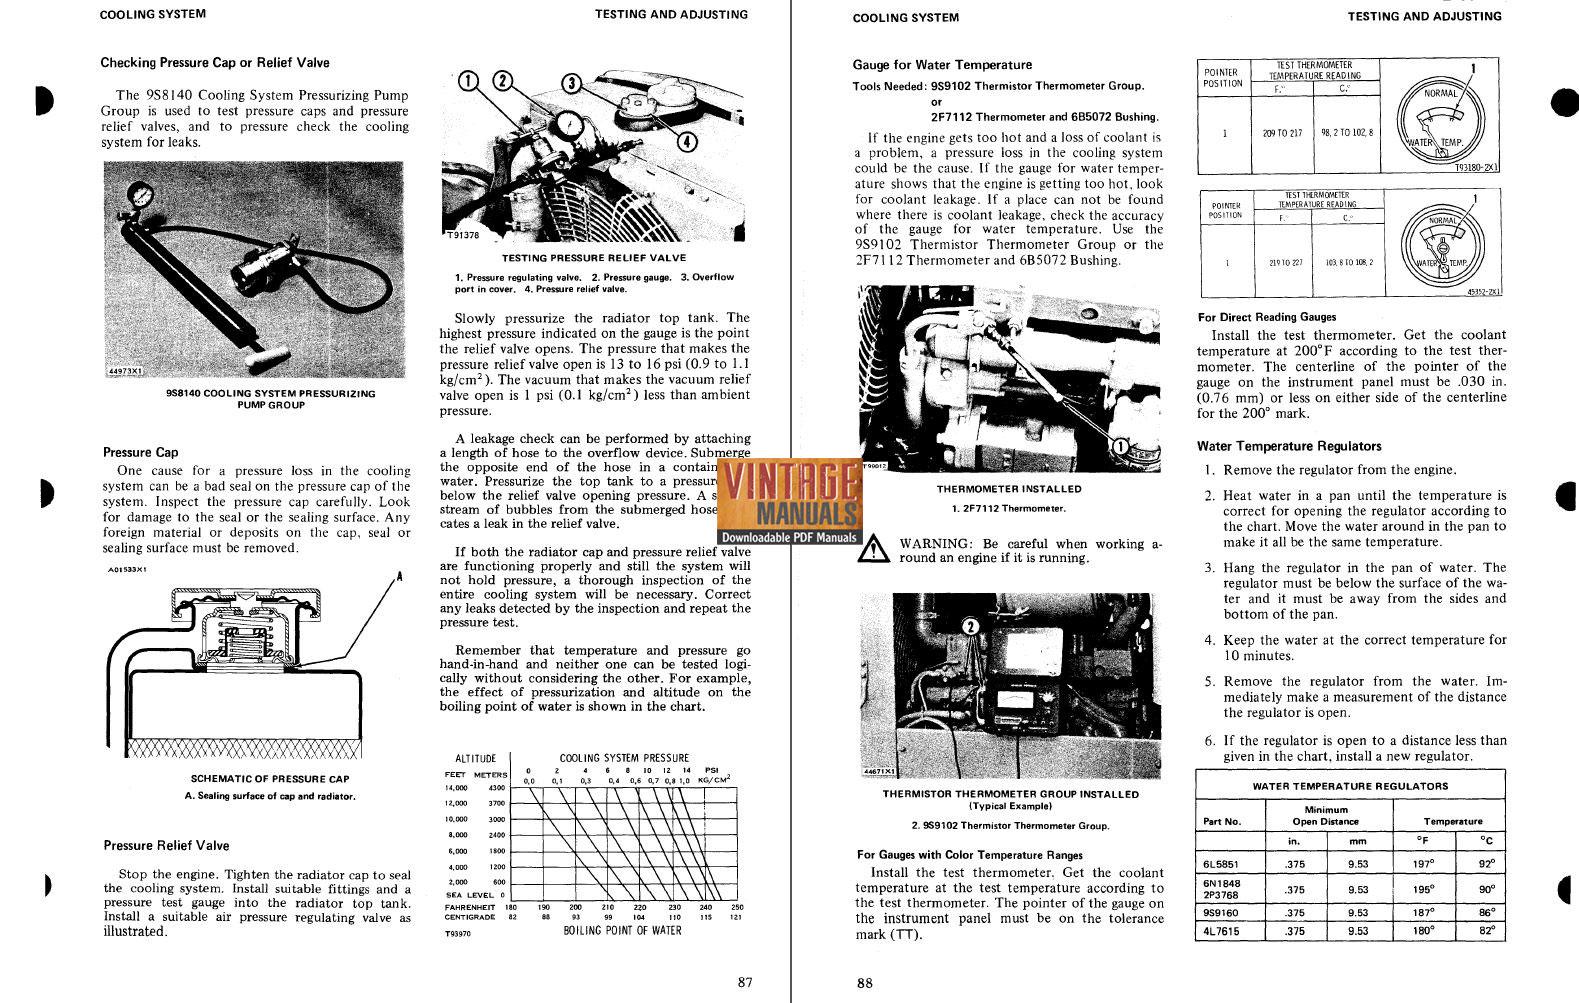 3304 cat engine manual manual array cat 3304 3306 78p 3n diesel engine systems operation testing rh vintagemanuals net fandeluxe Gallery